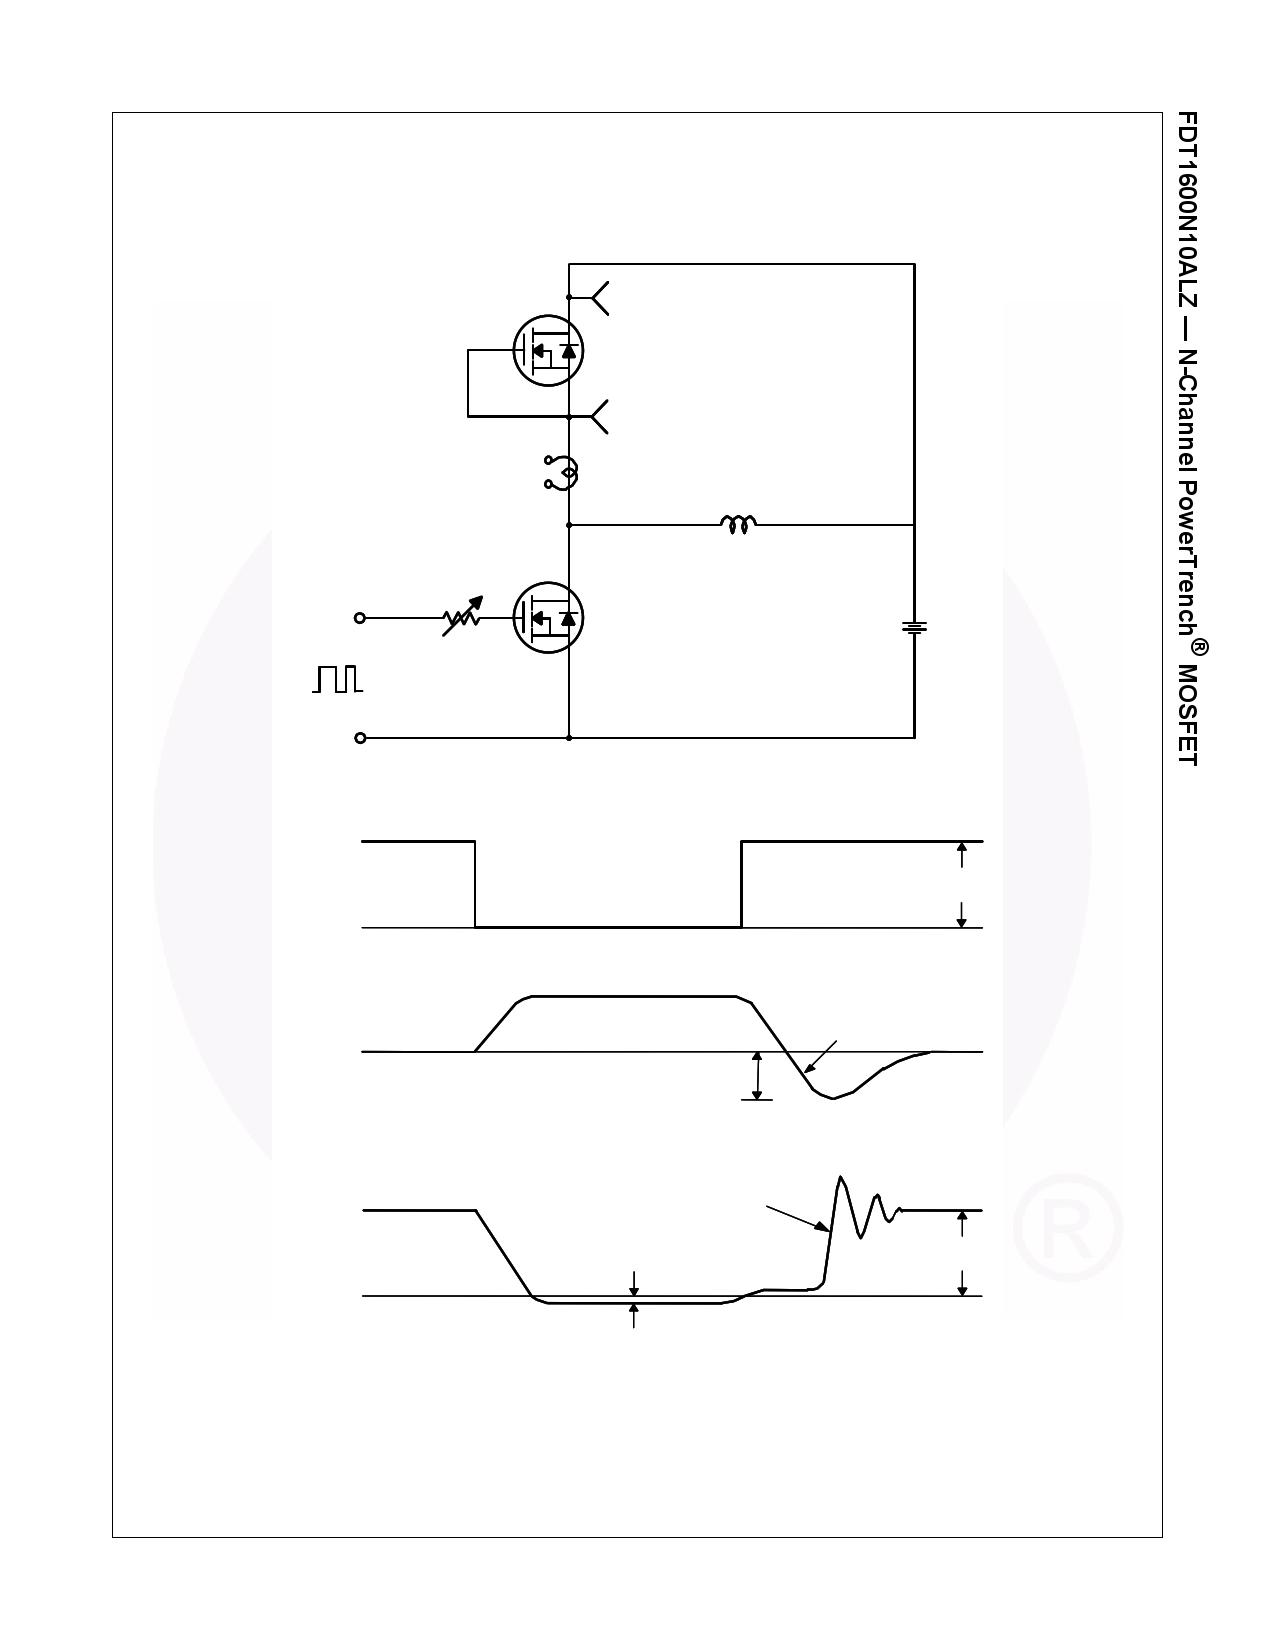 FDT1600N10ALZ 전자부품, 판매, 대치품